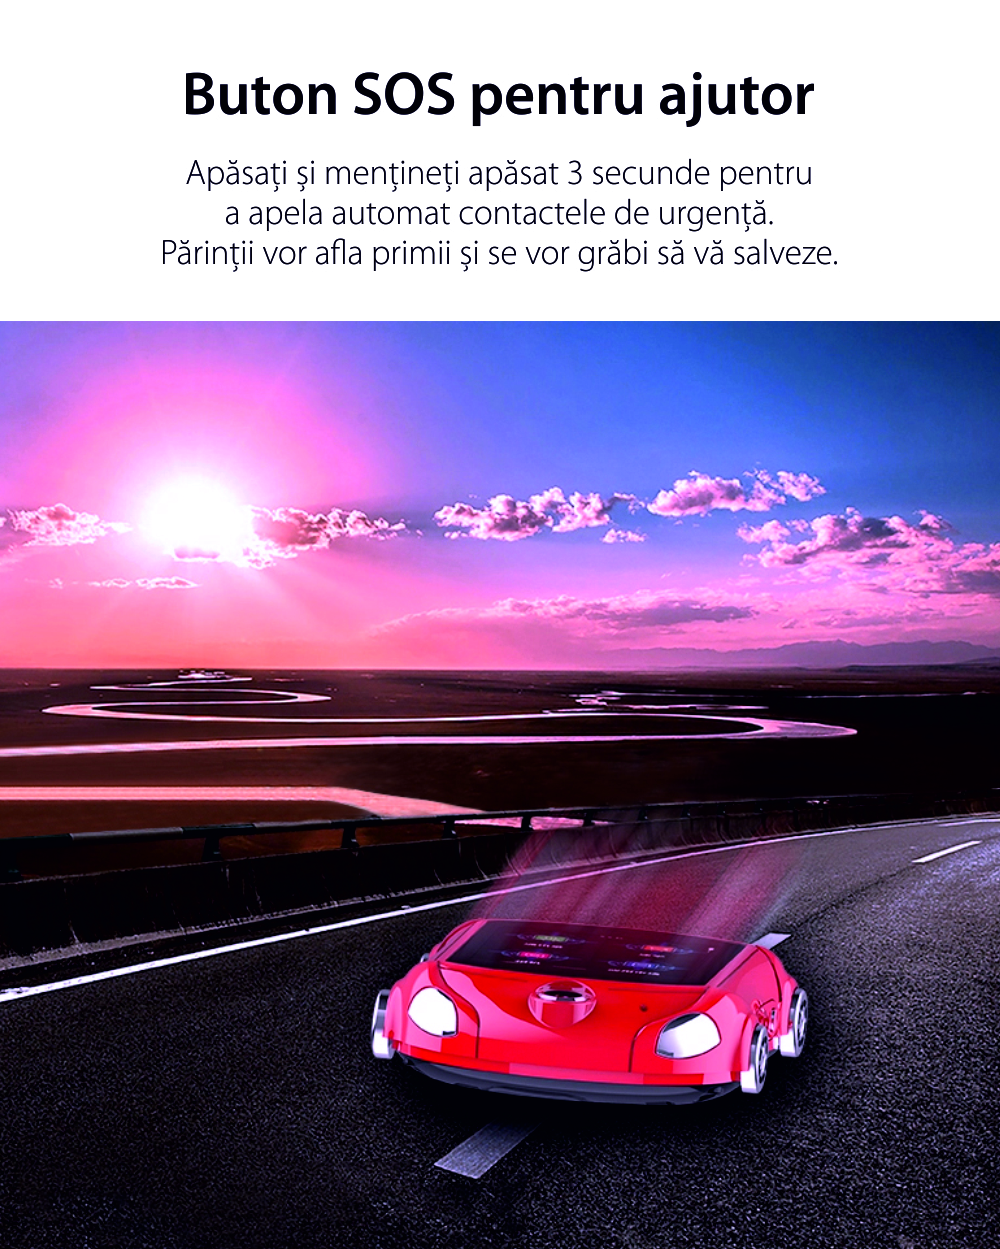 Ceas Smartwatch Pentru Copii, Wonlex KT14, Supercar, Rosu, SIM card, 4G, Rezistent la stropi accidentali IP54, Apel video